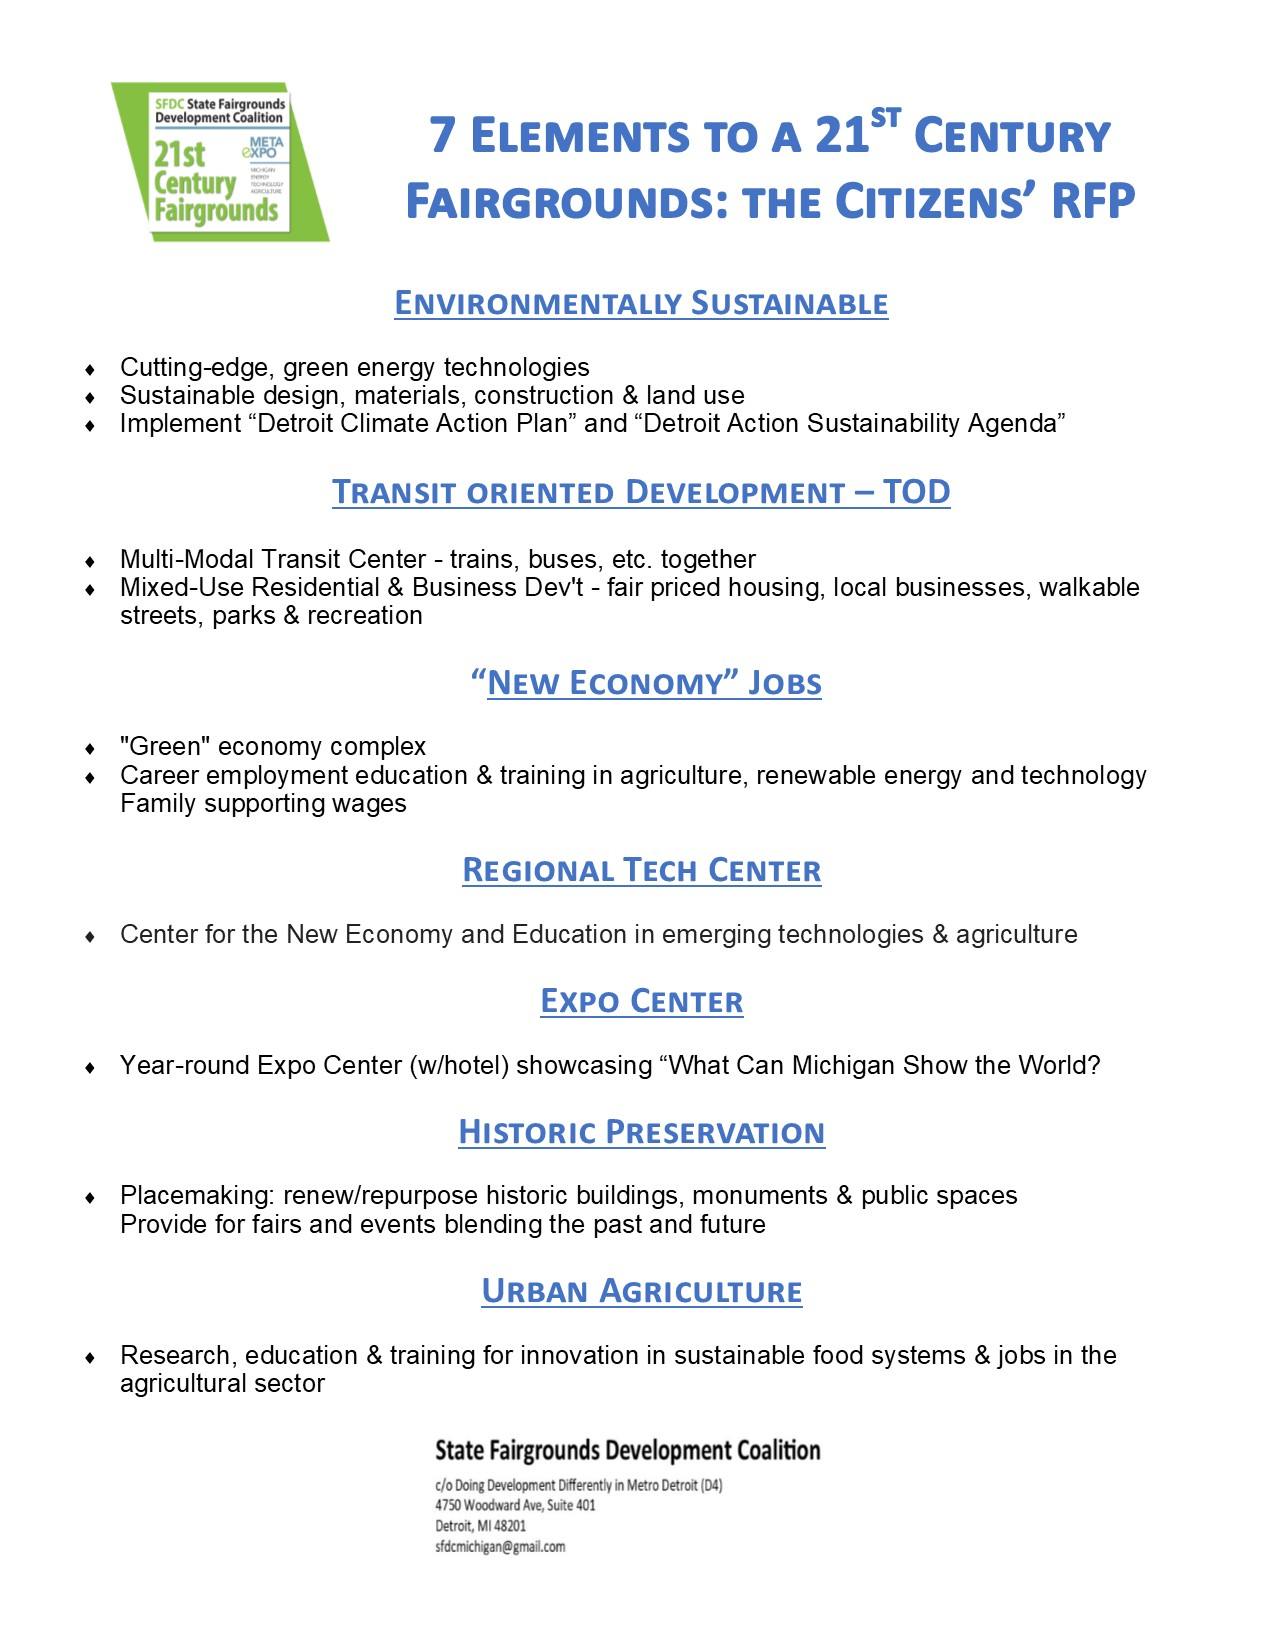 7 ELEMENTS Citizens' RFP.jpg